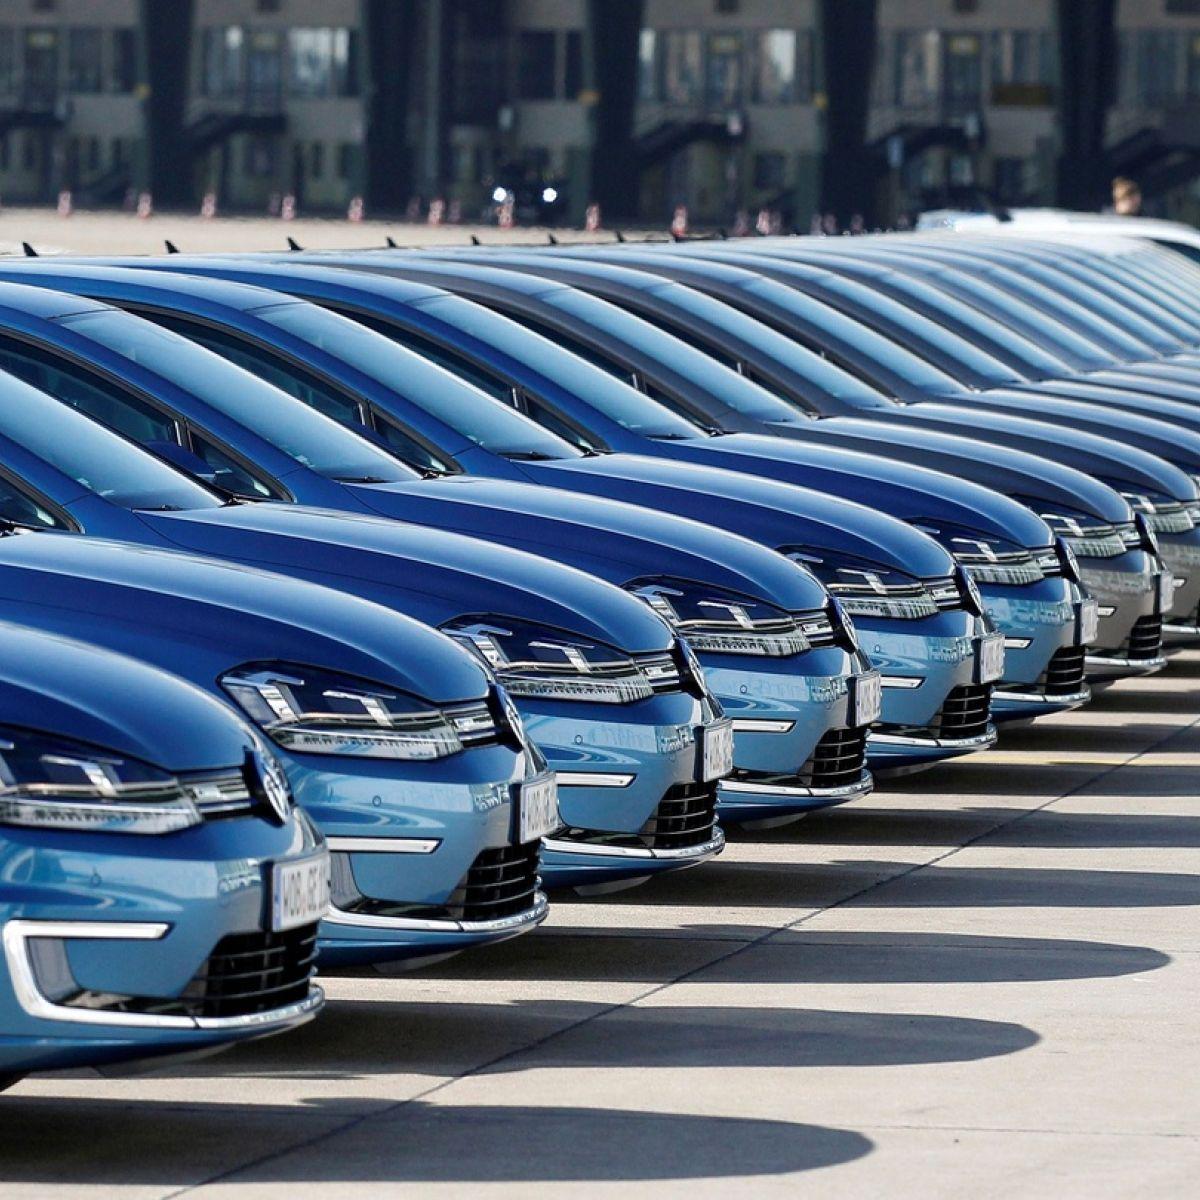 Volkswagen legal team walks out of Castlebar court - The Irish